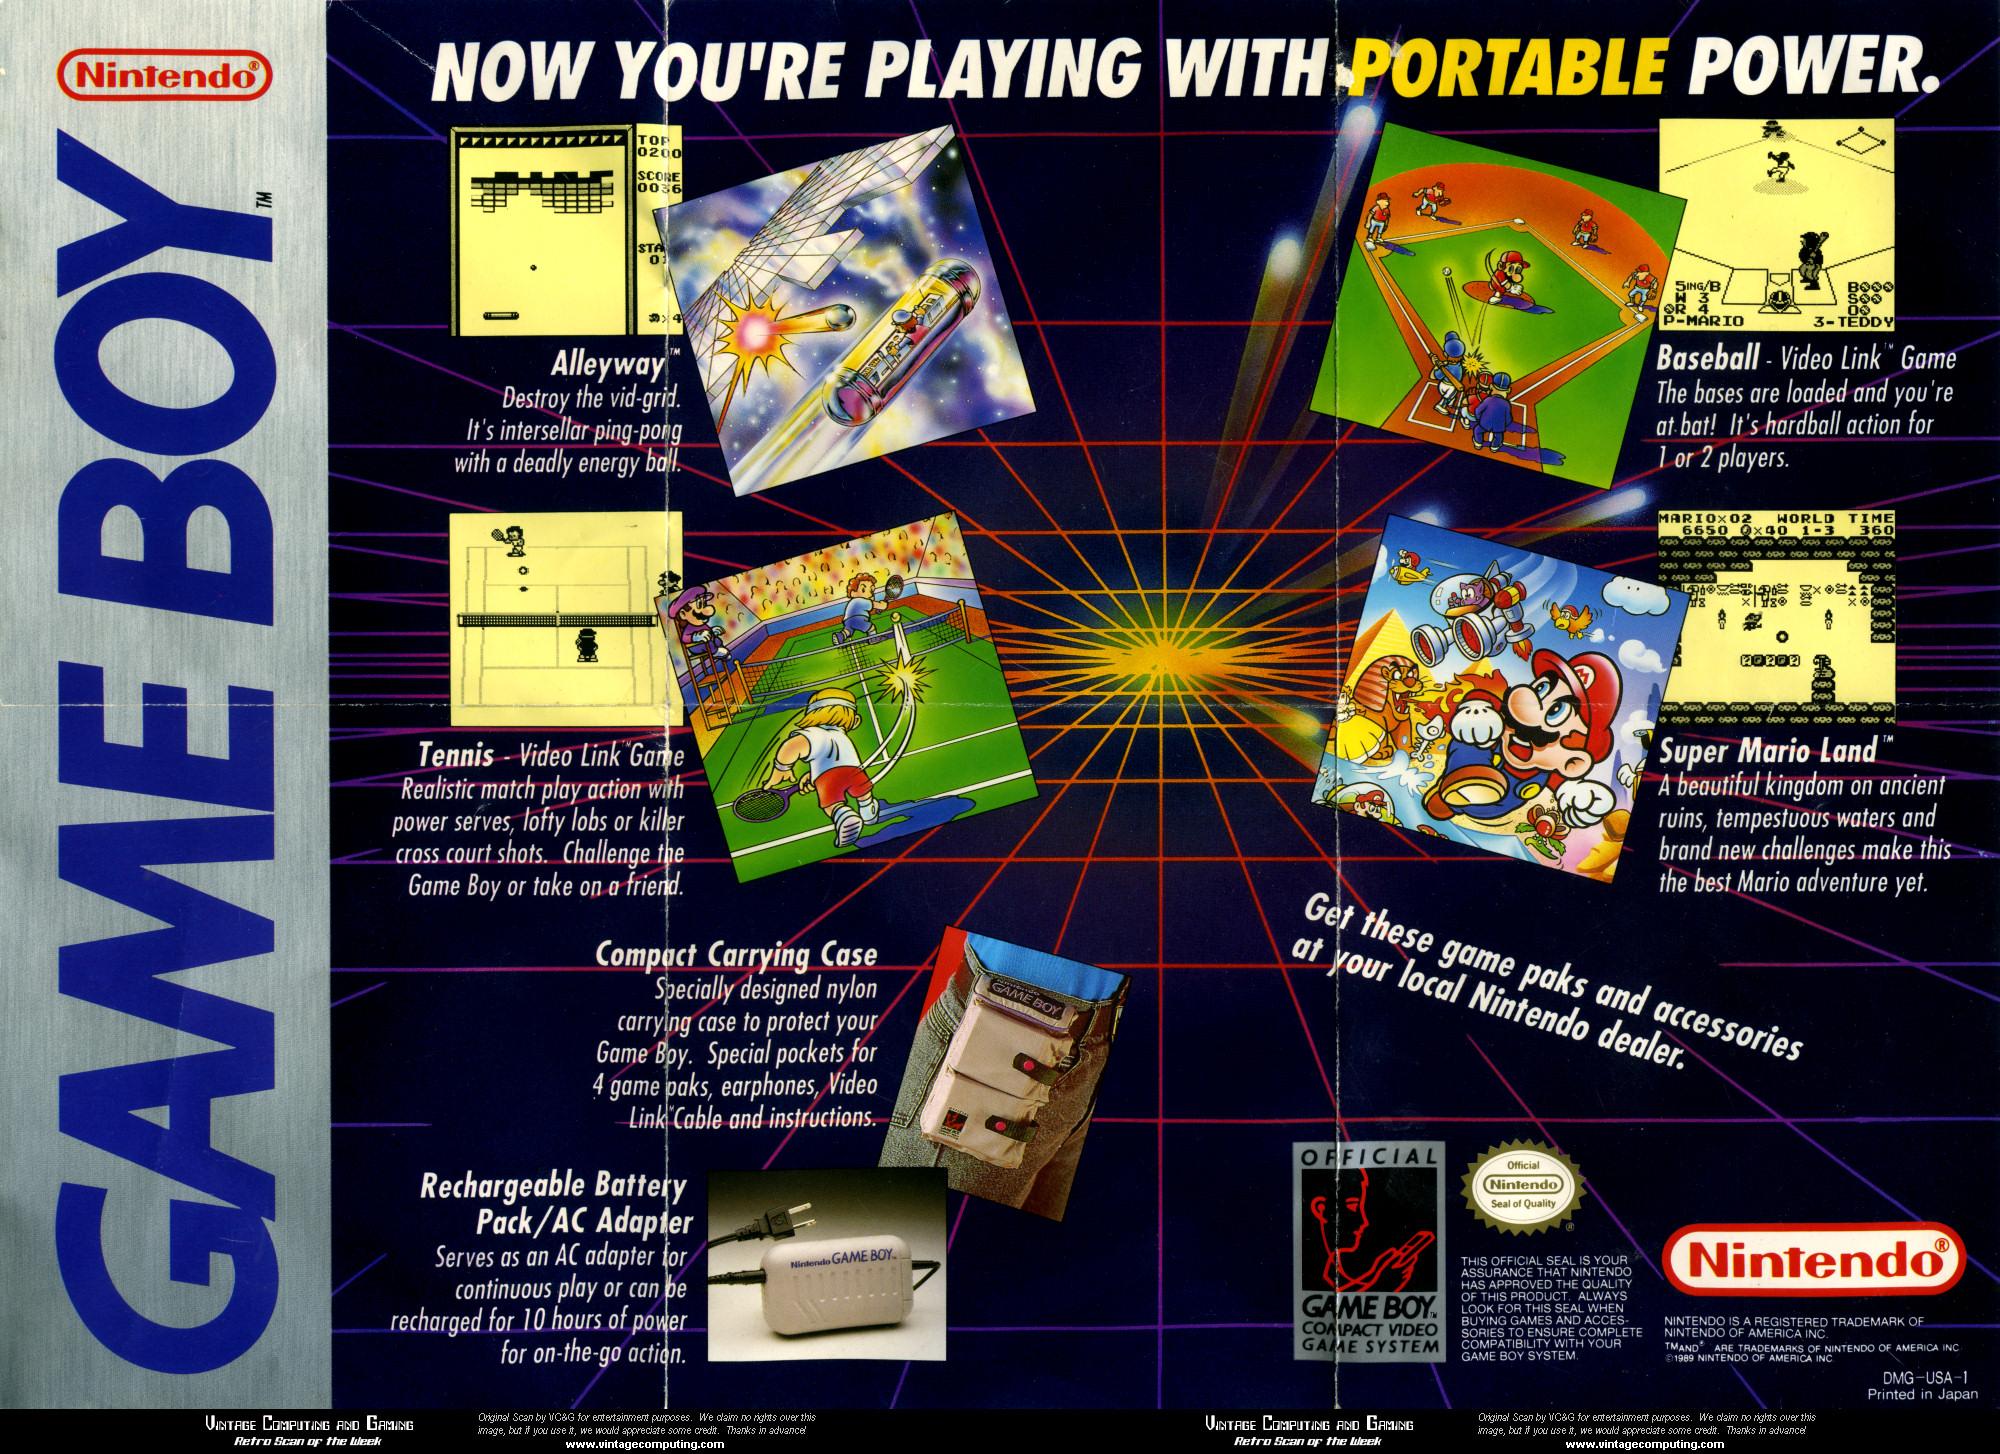 game_boy_portable_power_large